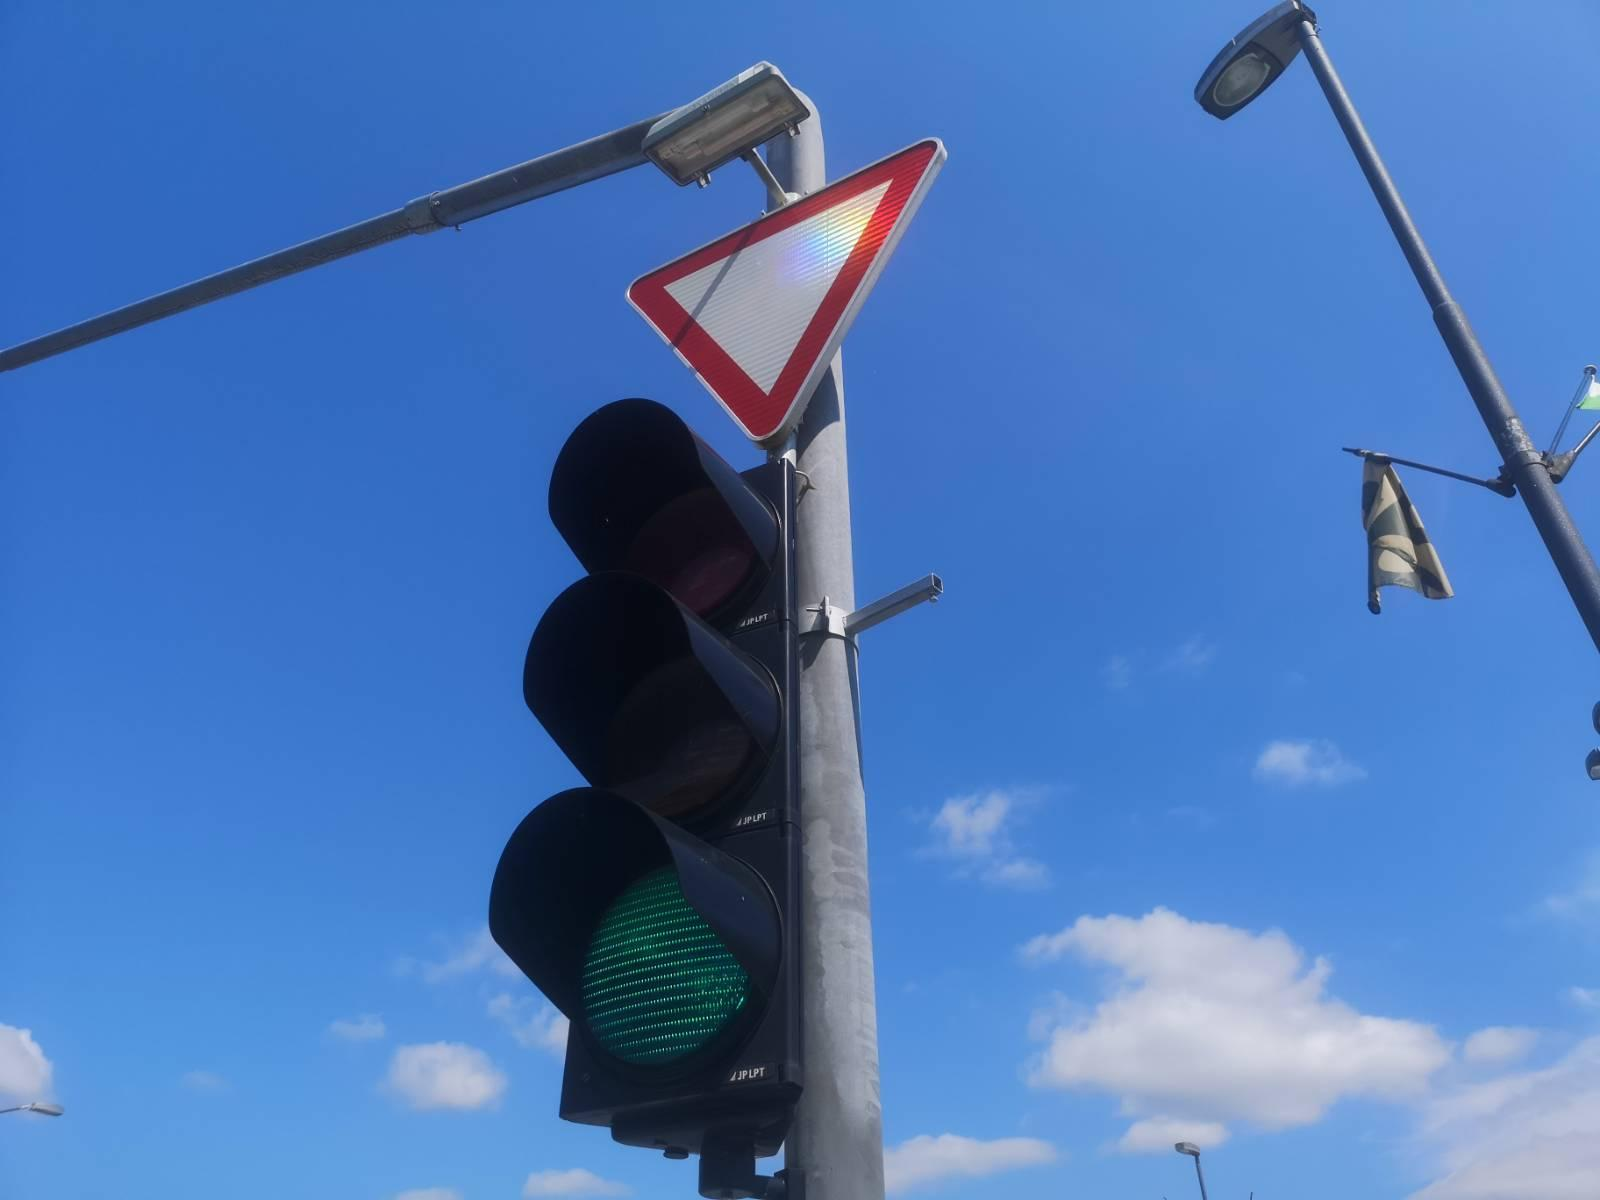 Semafor znak v desno